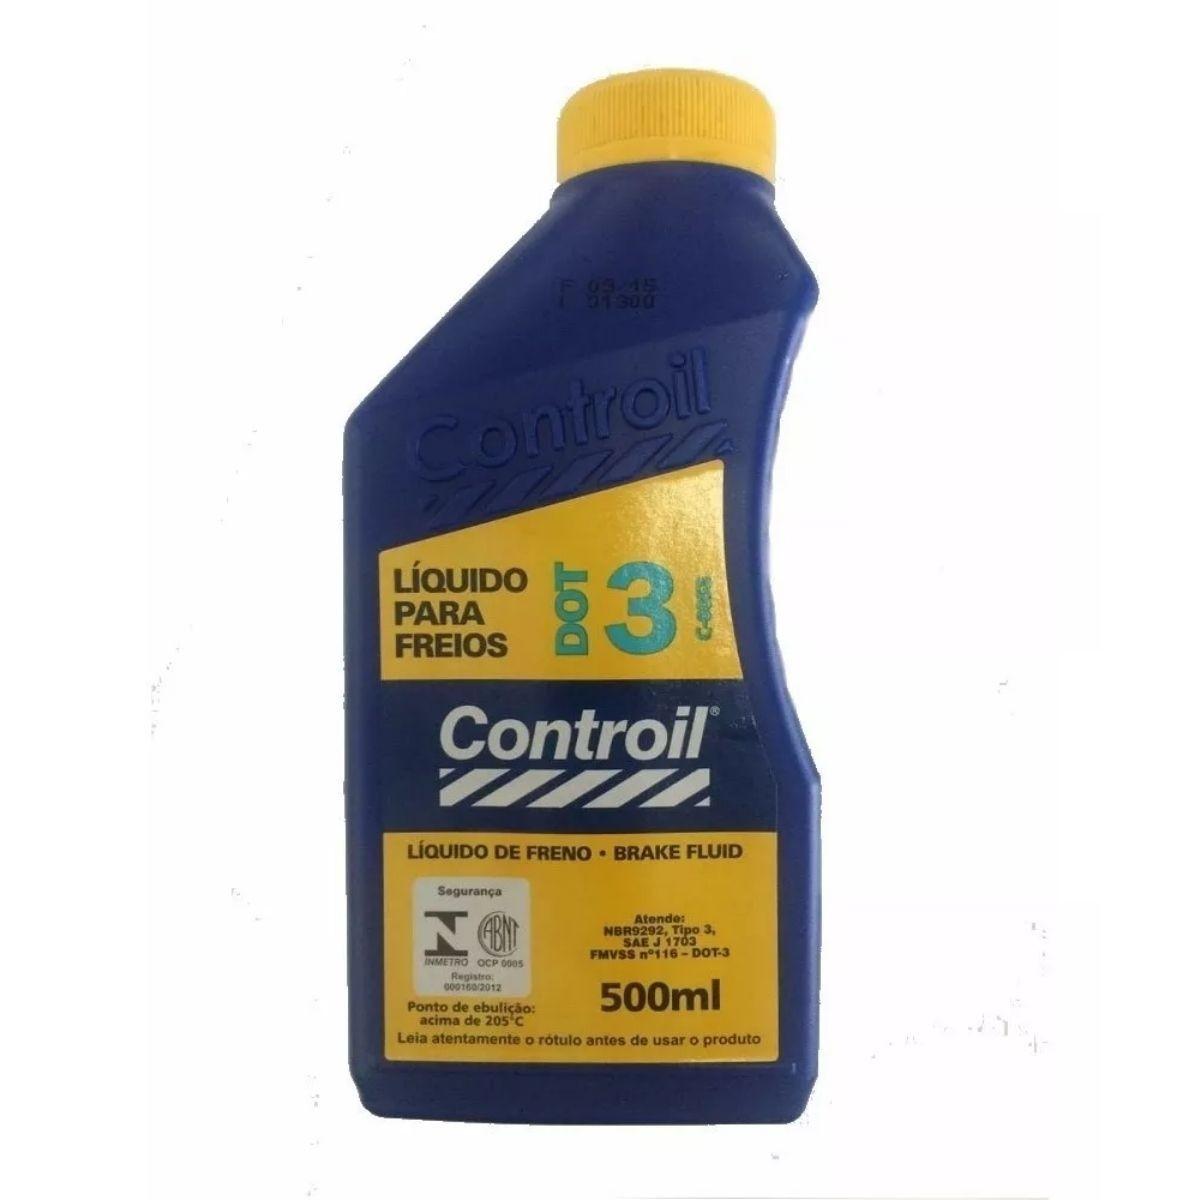 Fluido de Freio (Líquido de Freio) DOT3 Controil 500ml